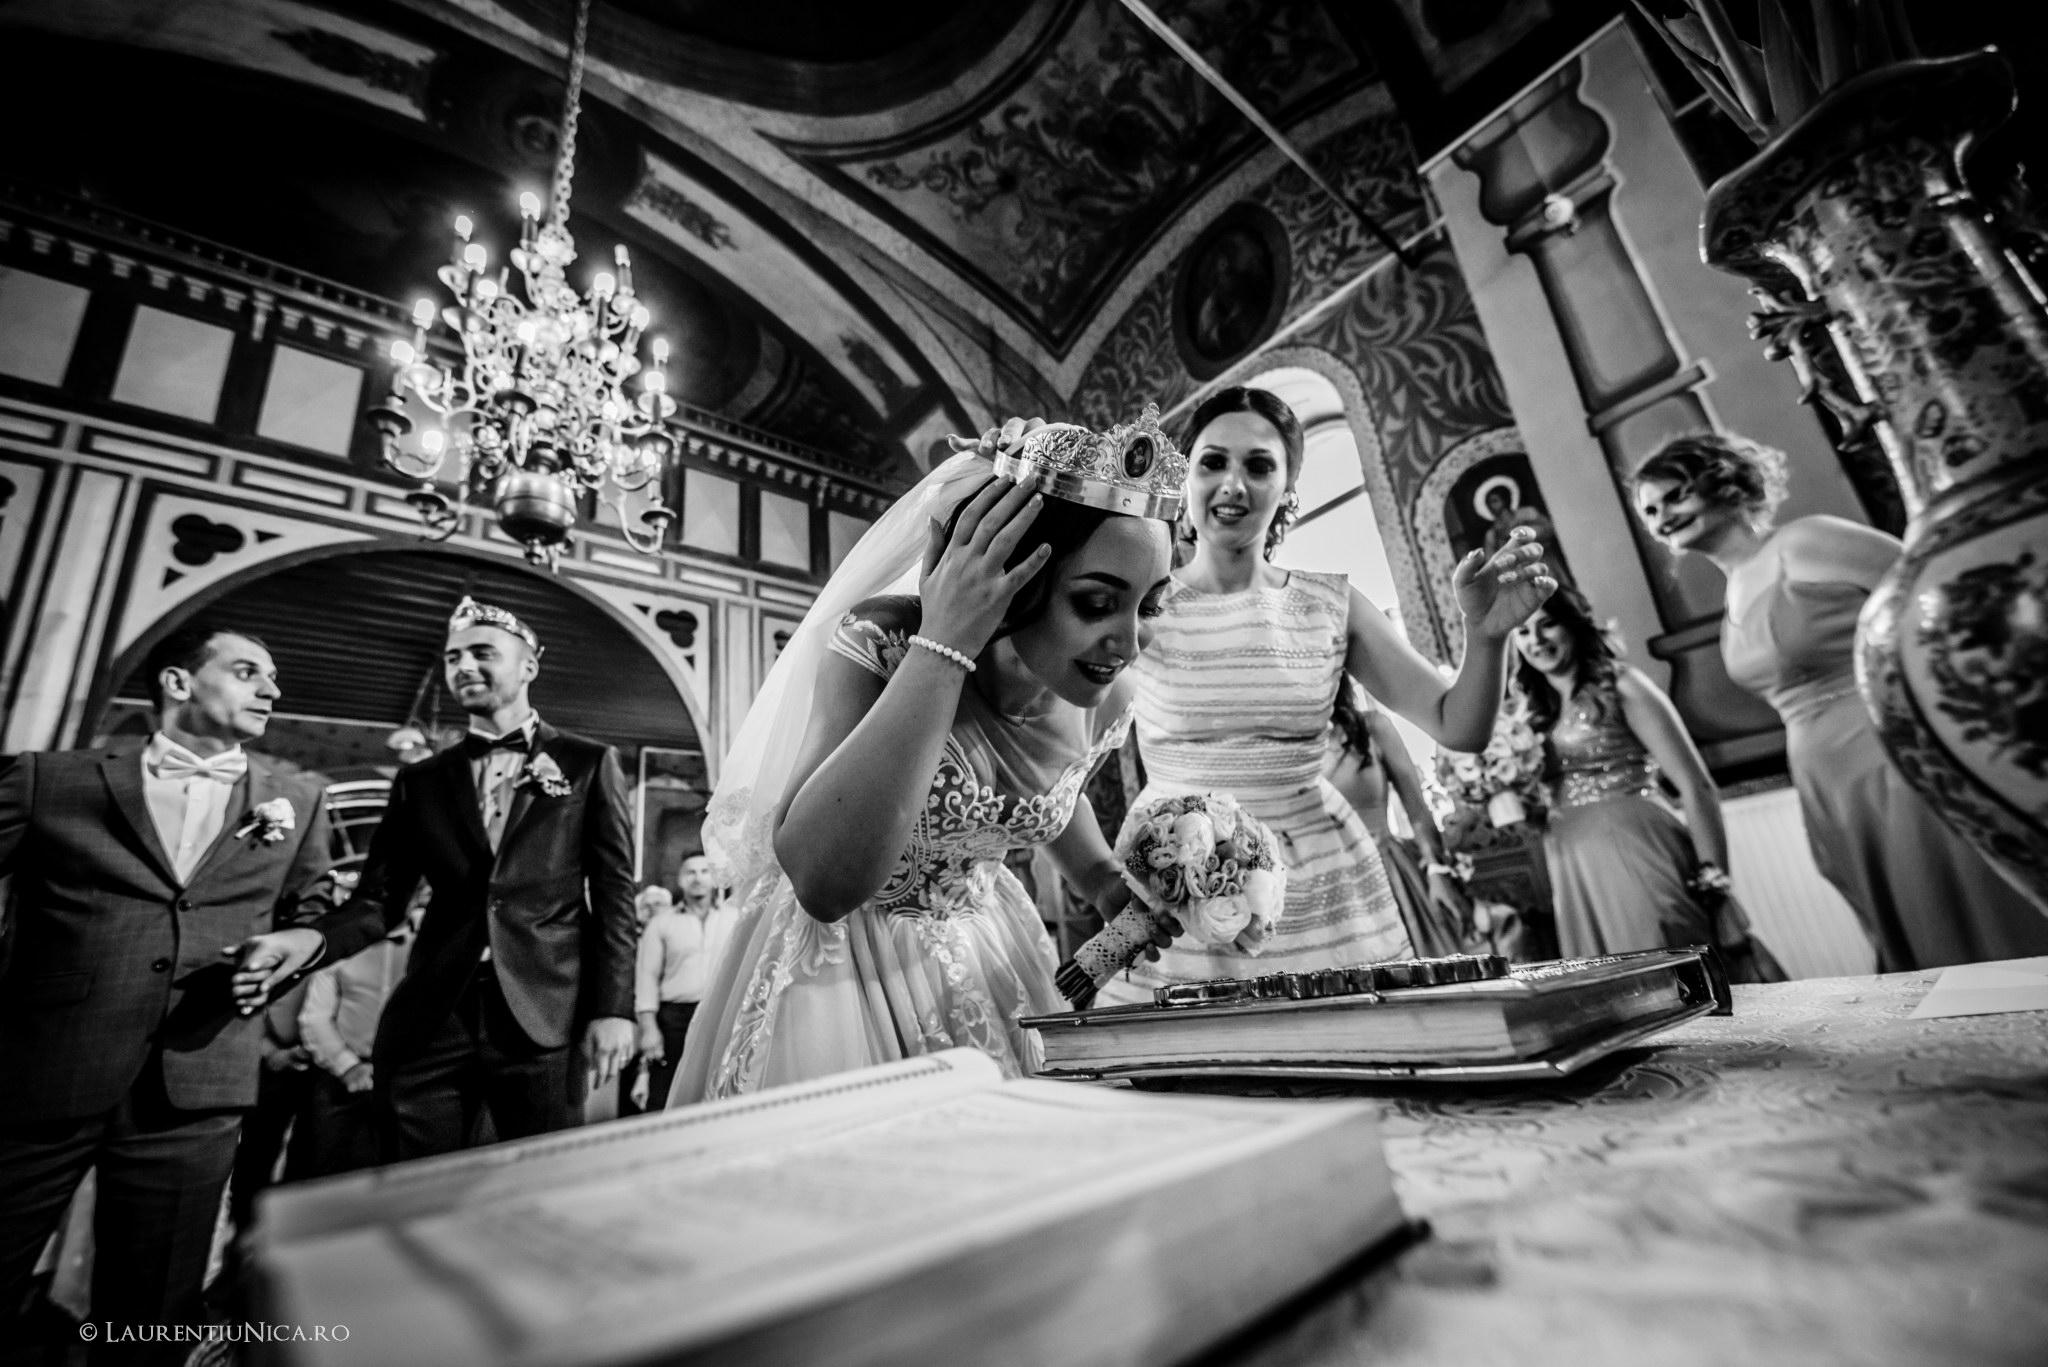 daiana si madalin fotograf nunta laurentiu nica targu jiu gorj 23 - Daiana & Madalin | Fotografii nunta | Targu-Jiu | Gorj